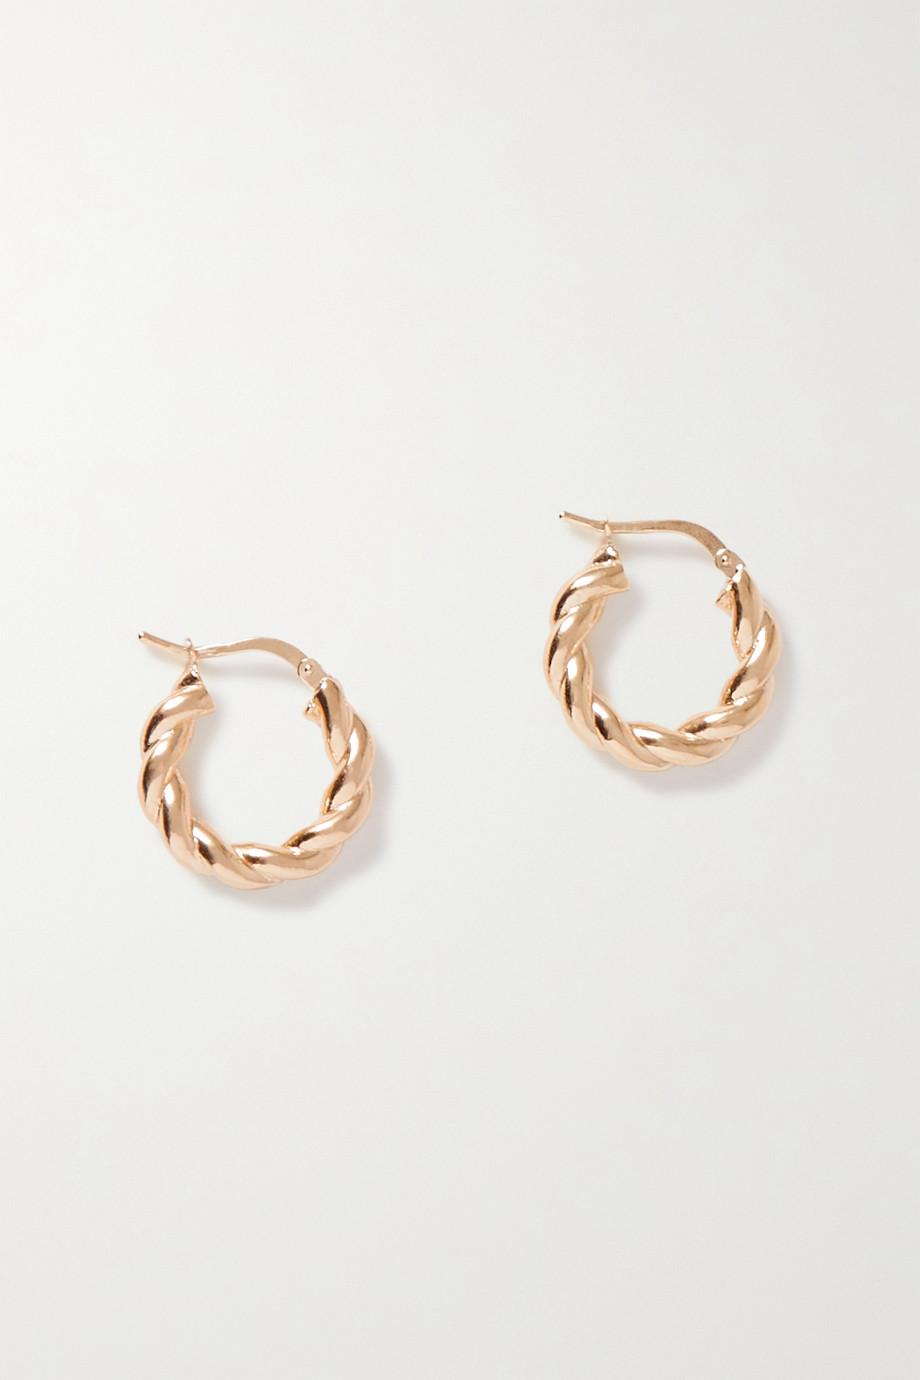 Bottega Veneta Gold-plated hoop earrings